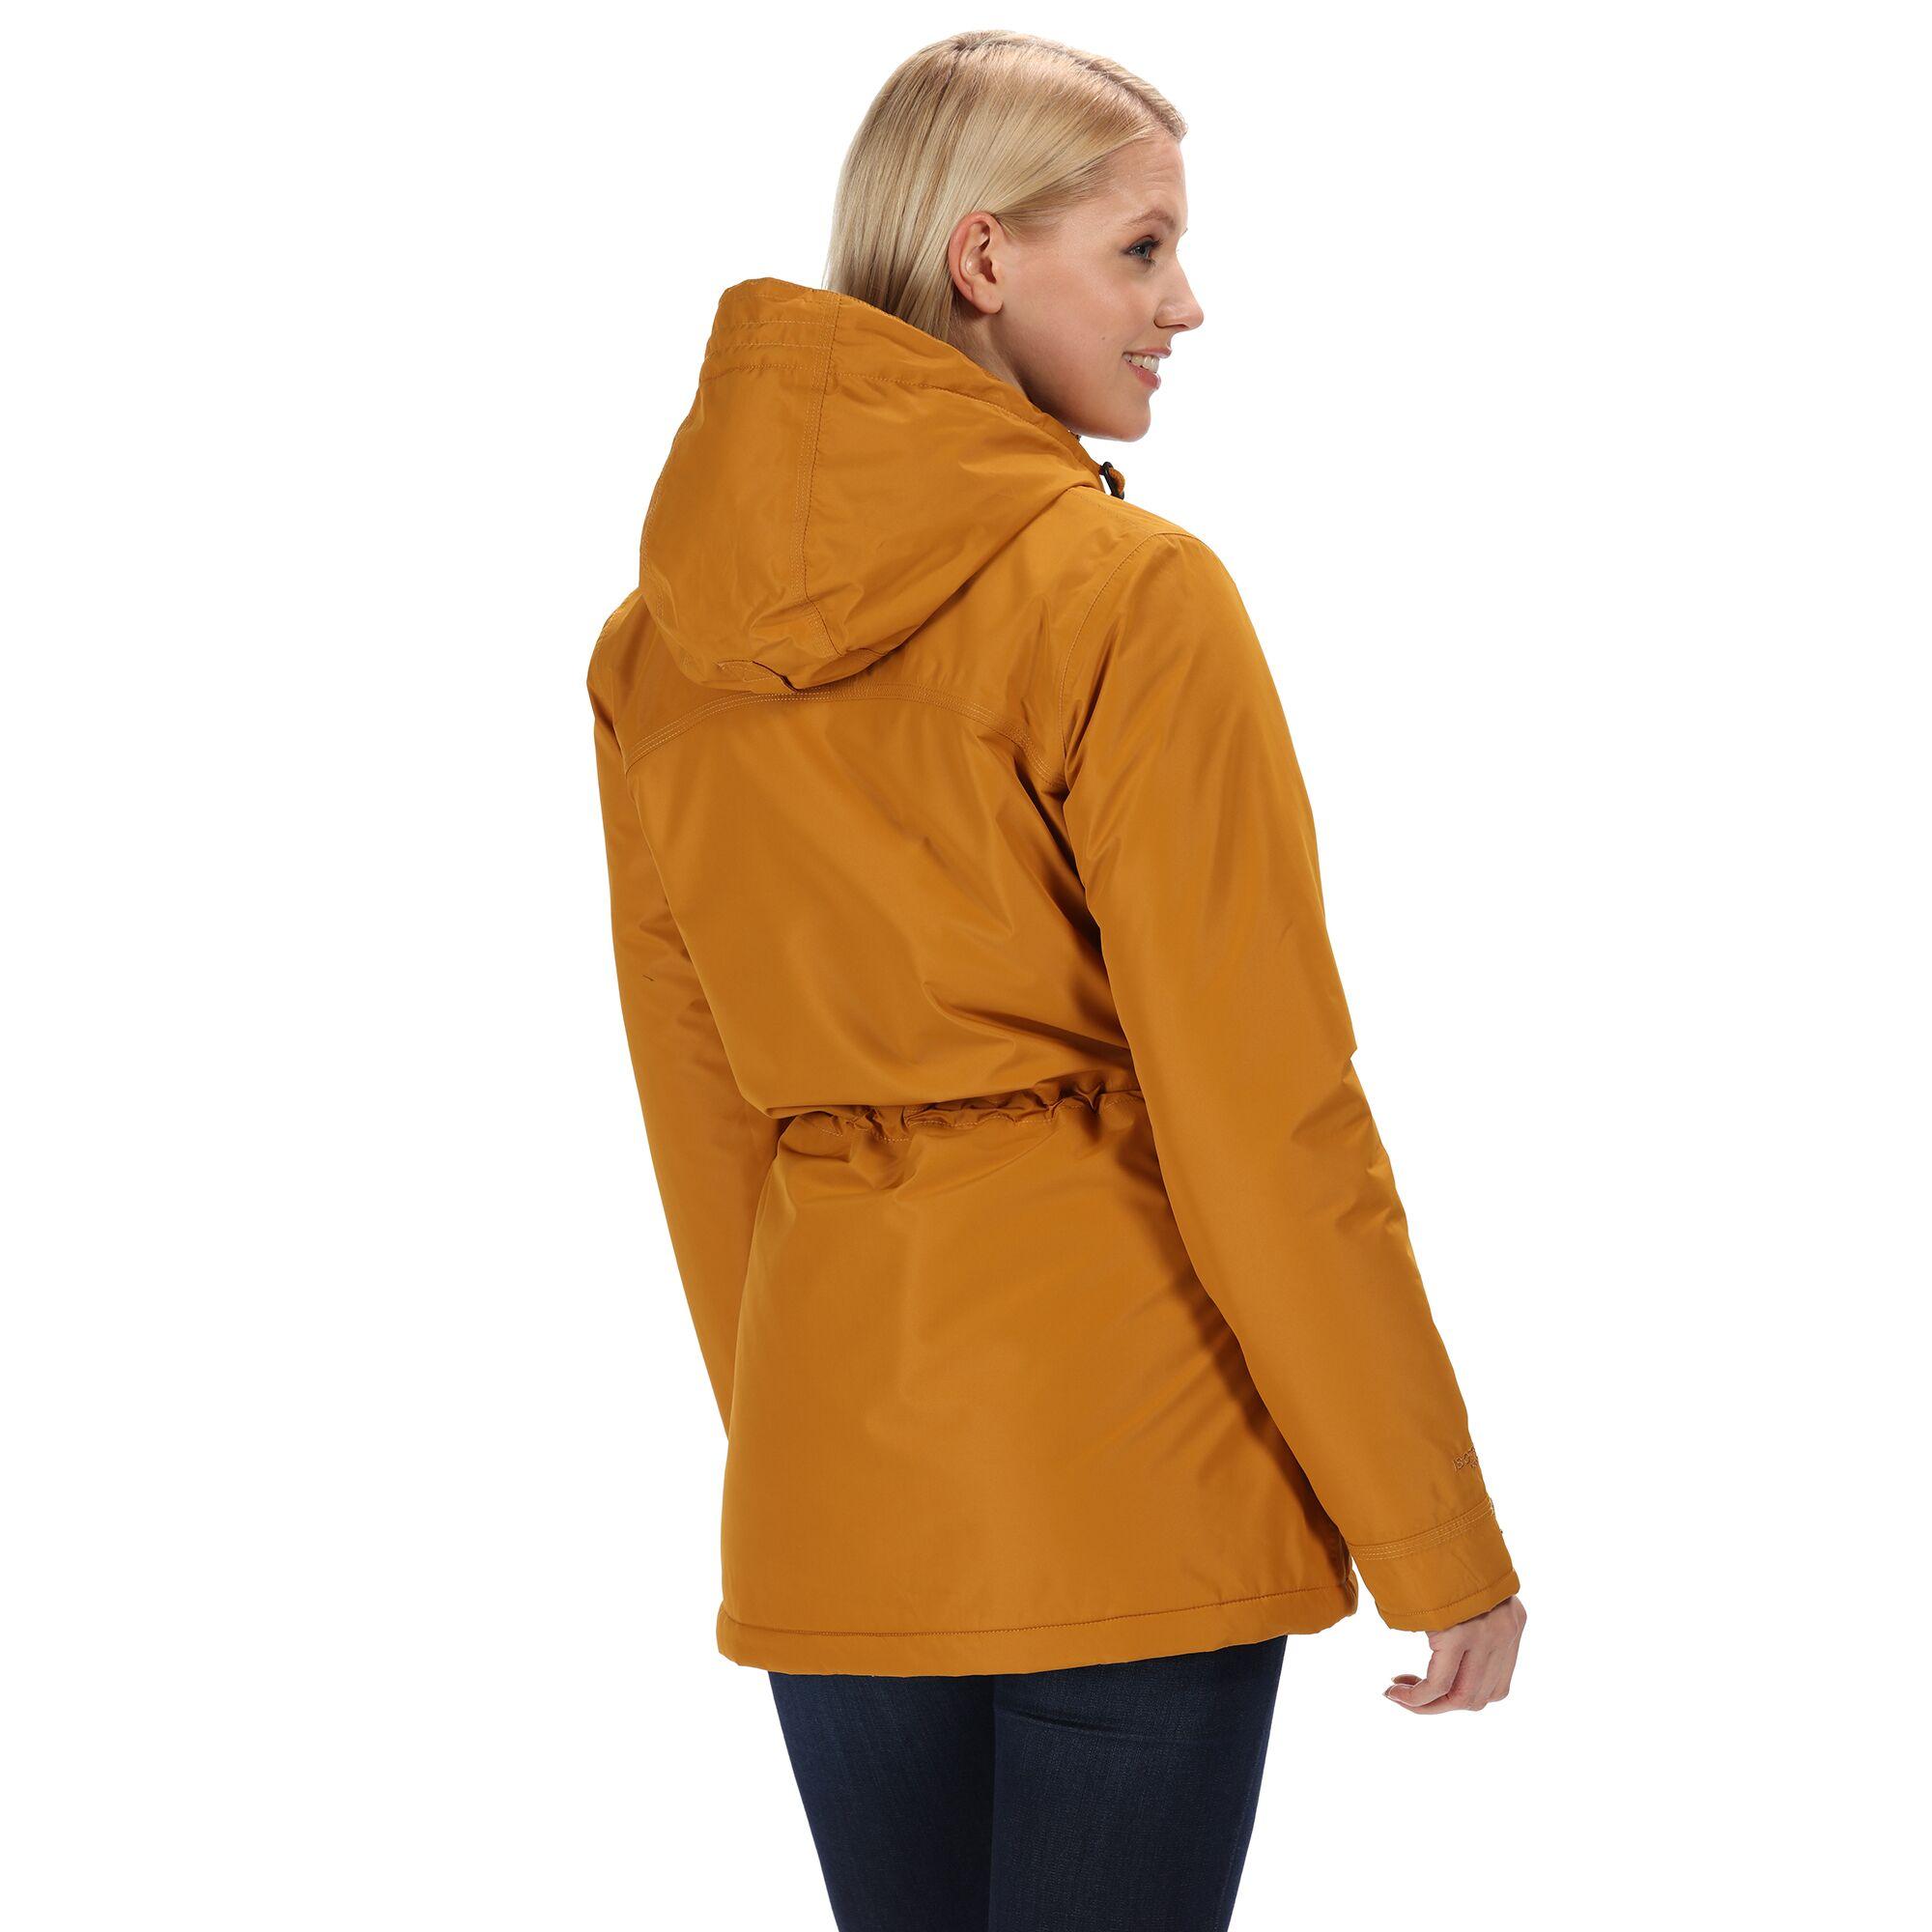 Regatta-Womens-Ladies-Braelynn-Long-Length-Waterproof-Jacket-RG4552 thumbnail 16